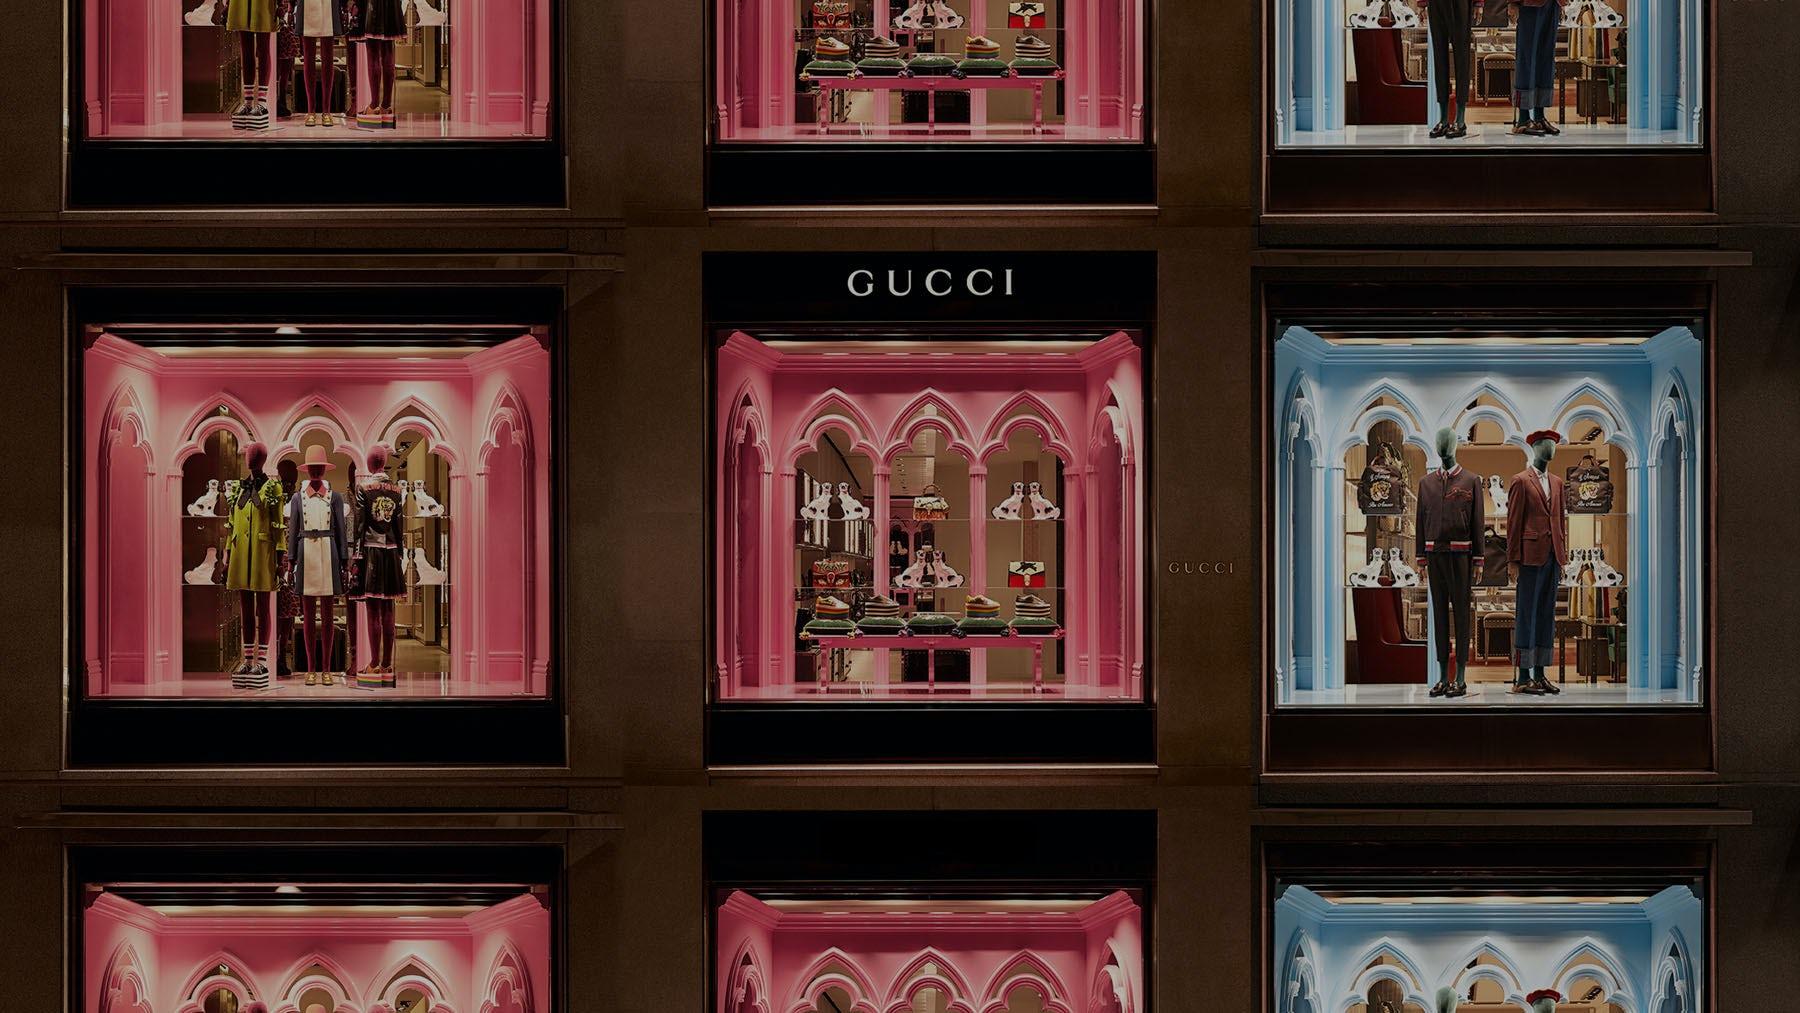 BoF Exclusive | Marco Bizzarri on Gucci's Remarkable Turnaround